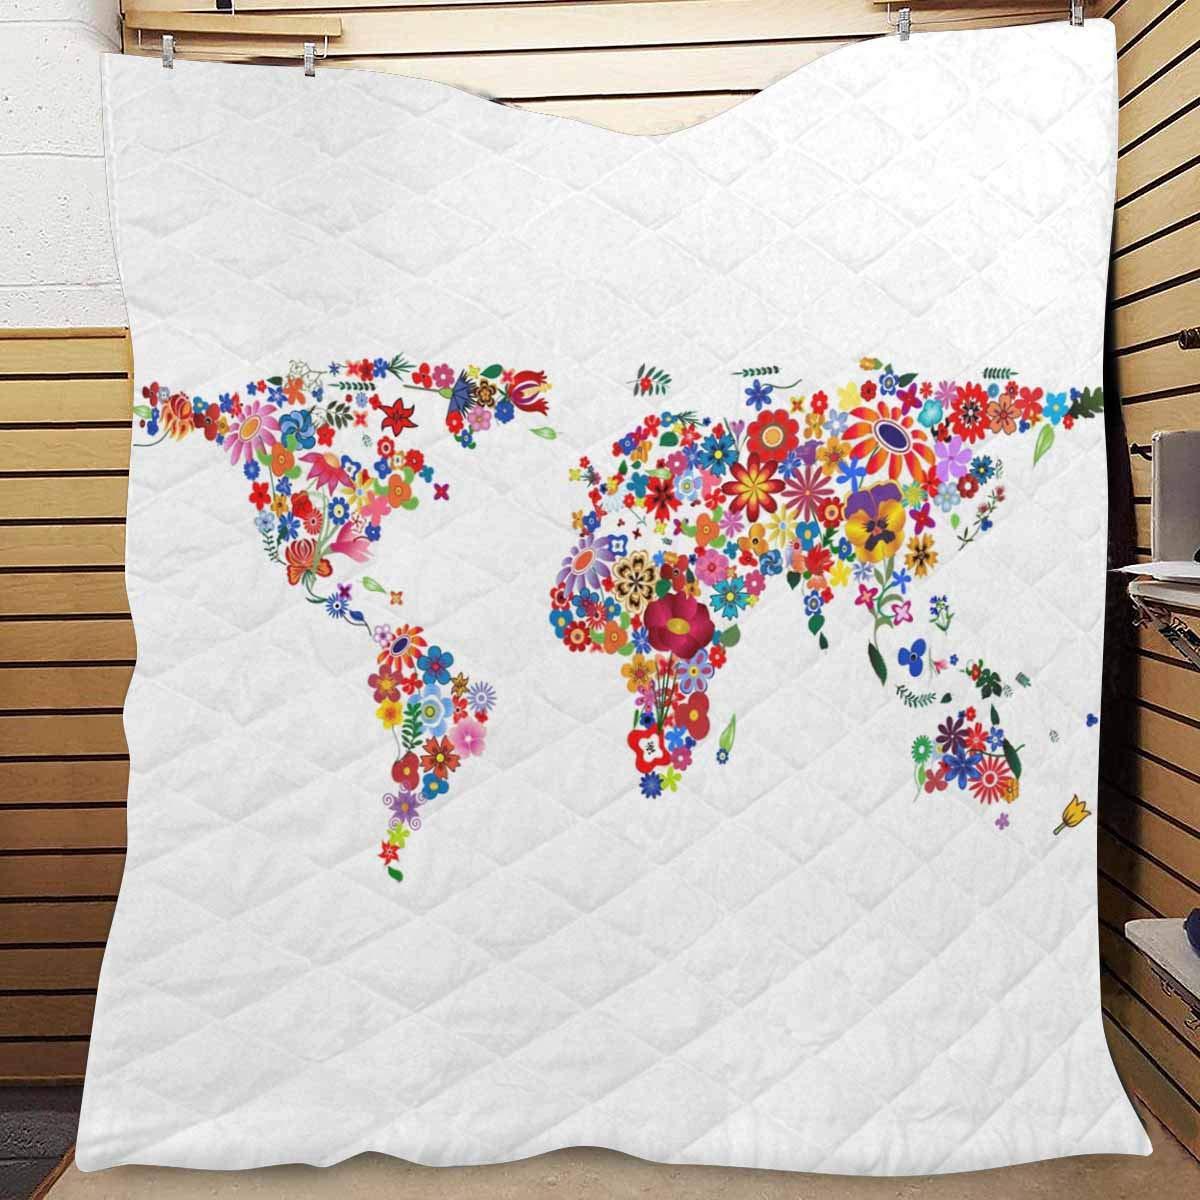 Amazon.com: InterestPrint World Map Made of Plenty Colorful ...